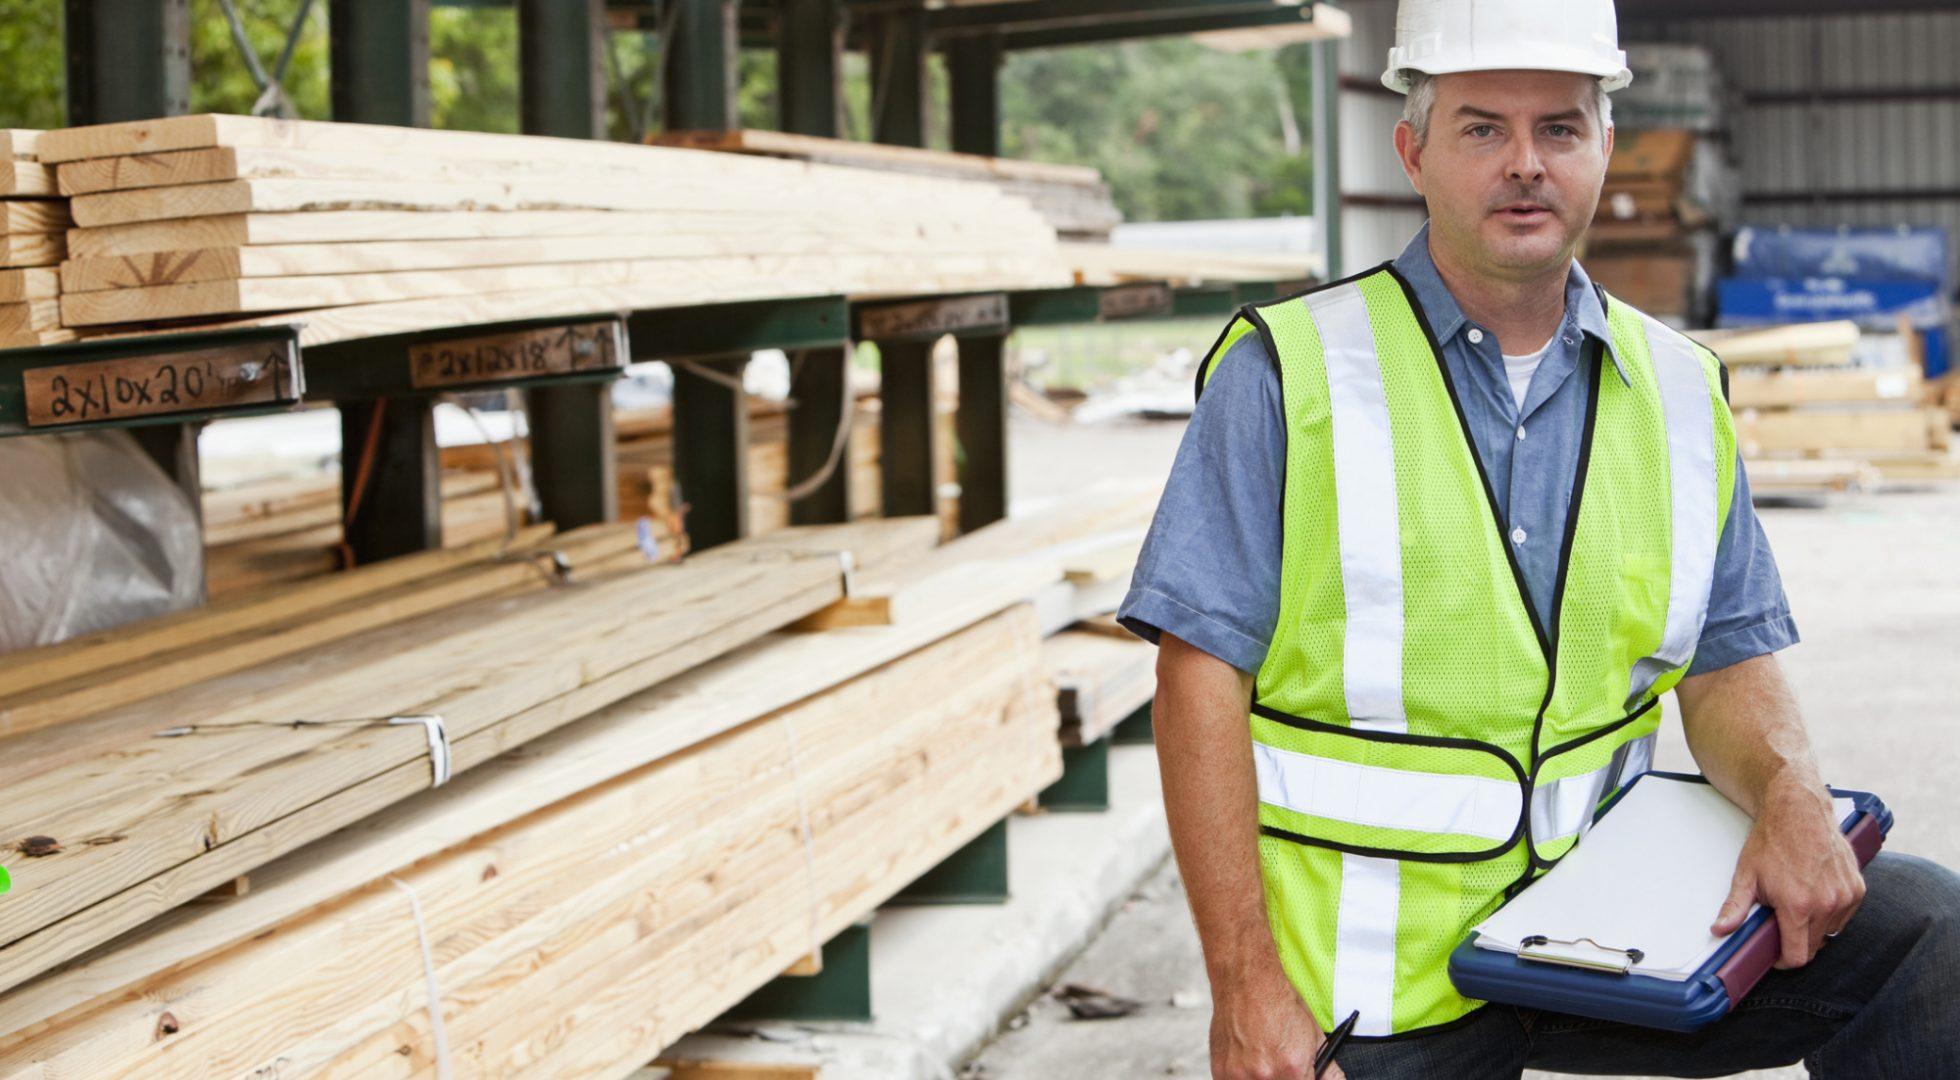 Man working in lumber yard